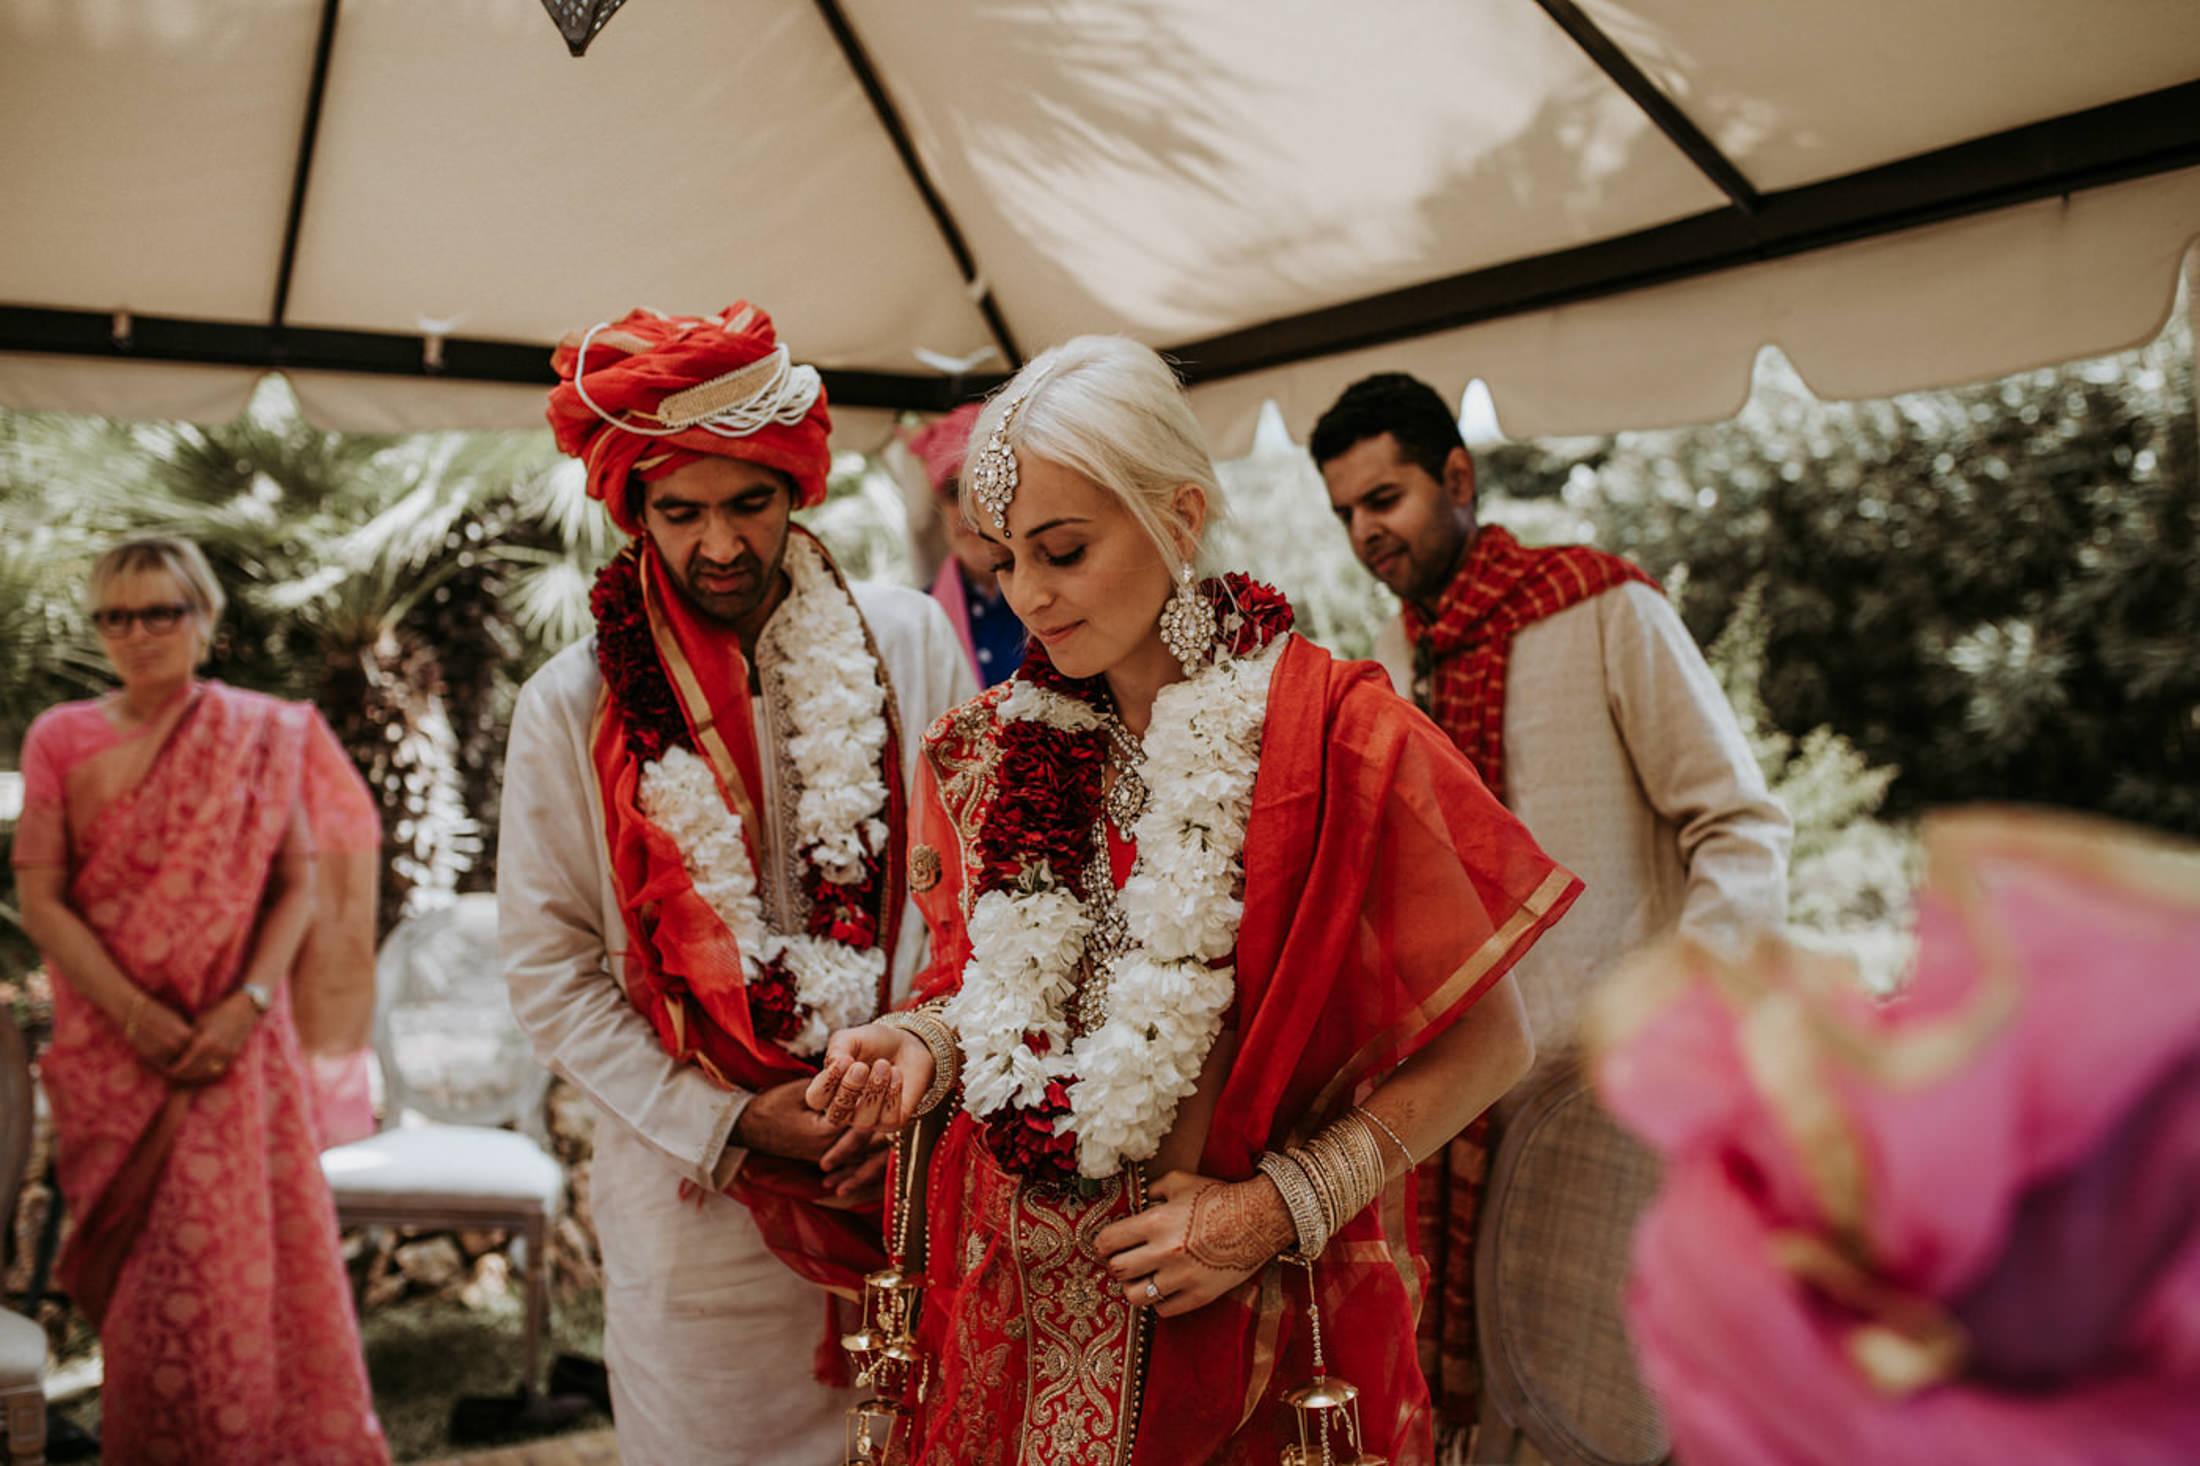 Wedding_Photographer_Mallorca_Daniela-Marquardt_Photography_New_York_Iceland_Tuscany_Santorini_Portugal_Austria_Bavaria_Elopement_Hochzeitsfotograf_AntjeRajat2_50